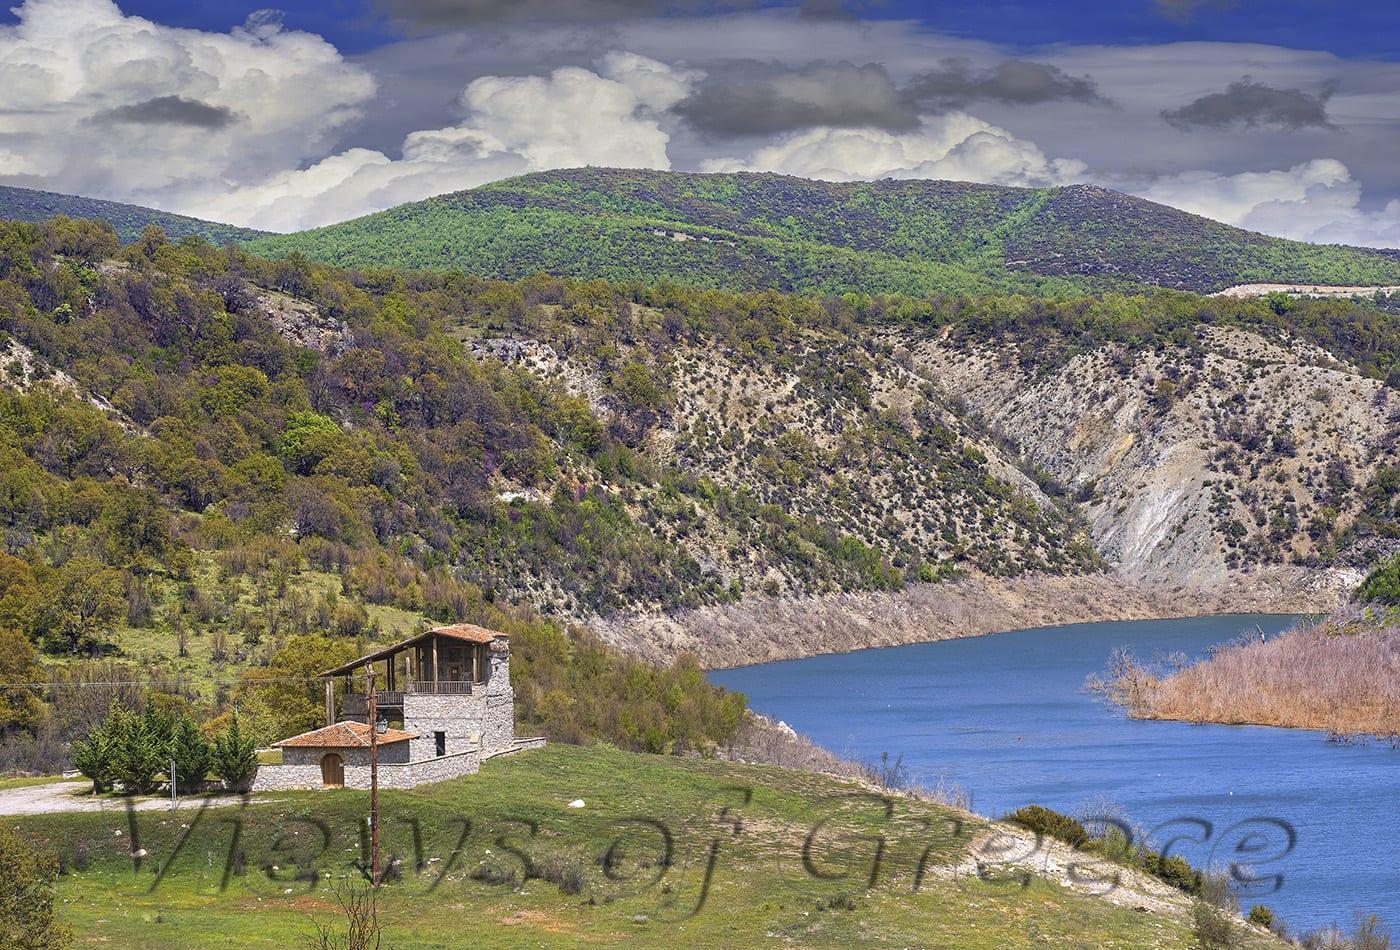 greece, nature, river, mountain, travel, aliakmonas, lake, aliakmonas river, Macedonia ποταμός Αλιάκμονας, λίμνη Ιλαρίωνα, μονή Ζάβορδας σκήτη όσιου Νικάνωρα, Δεσκάτη, ΔΕΗ, φράγμα, πανόραμα, νομός Γρεβενών, δυτική Μακεδονία